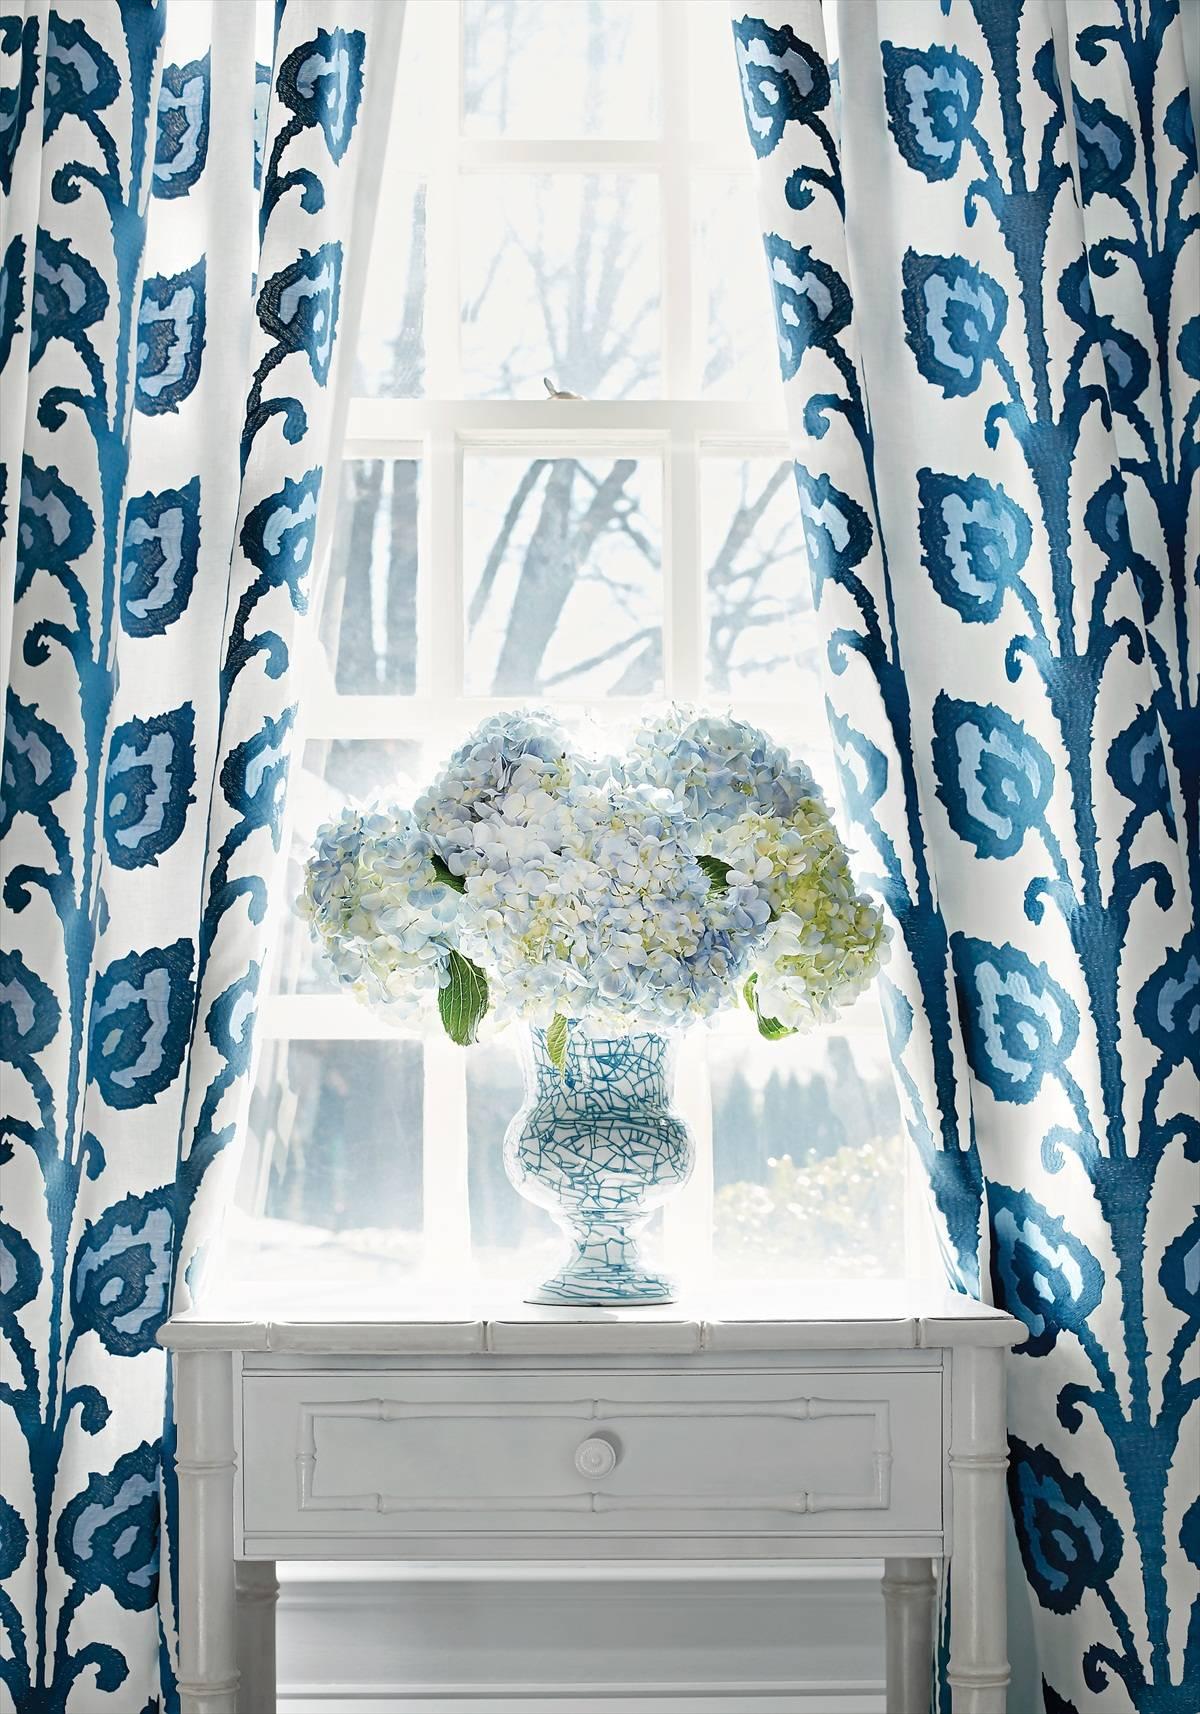 1200x1714_70_temecula-embroidery-w724319-fabric-bridgehampton-thibaut-2.jpg